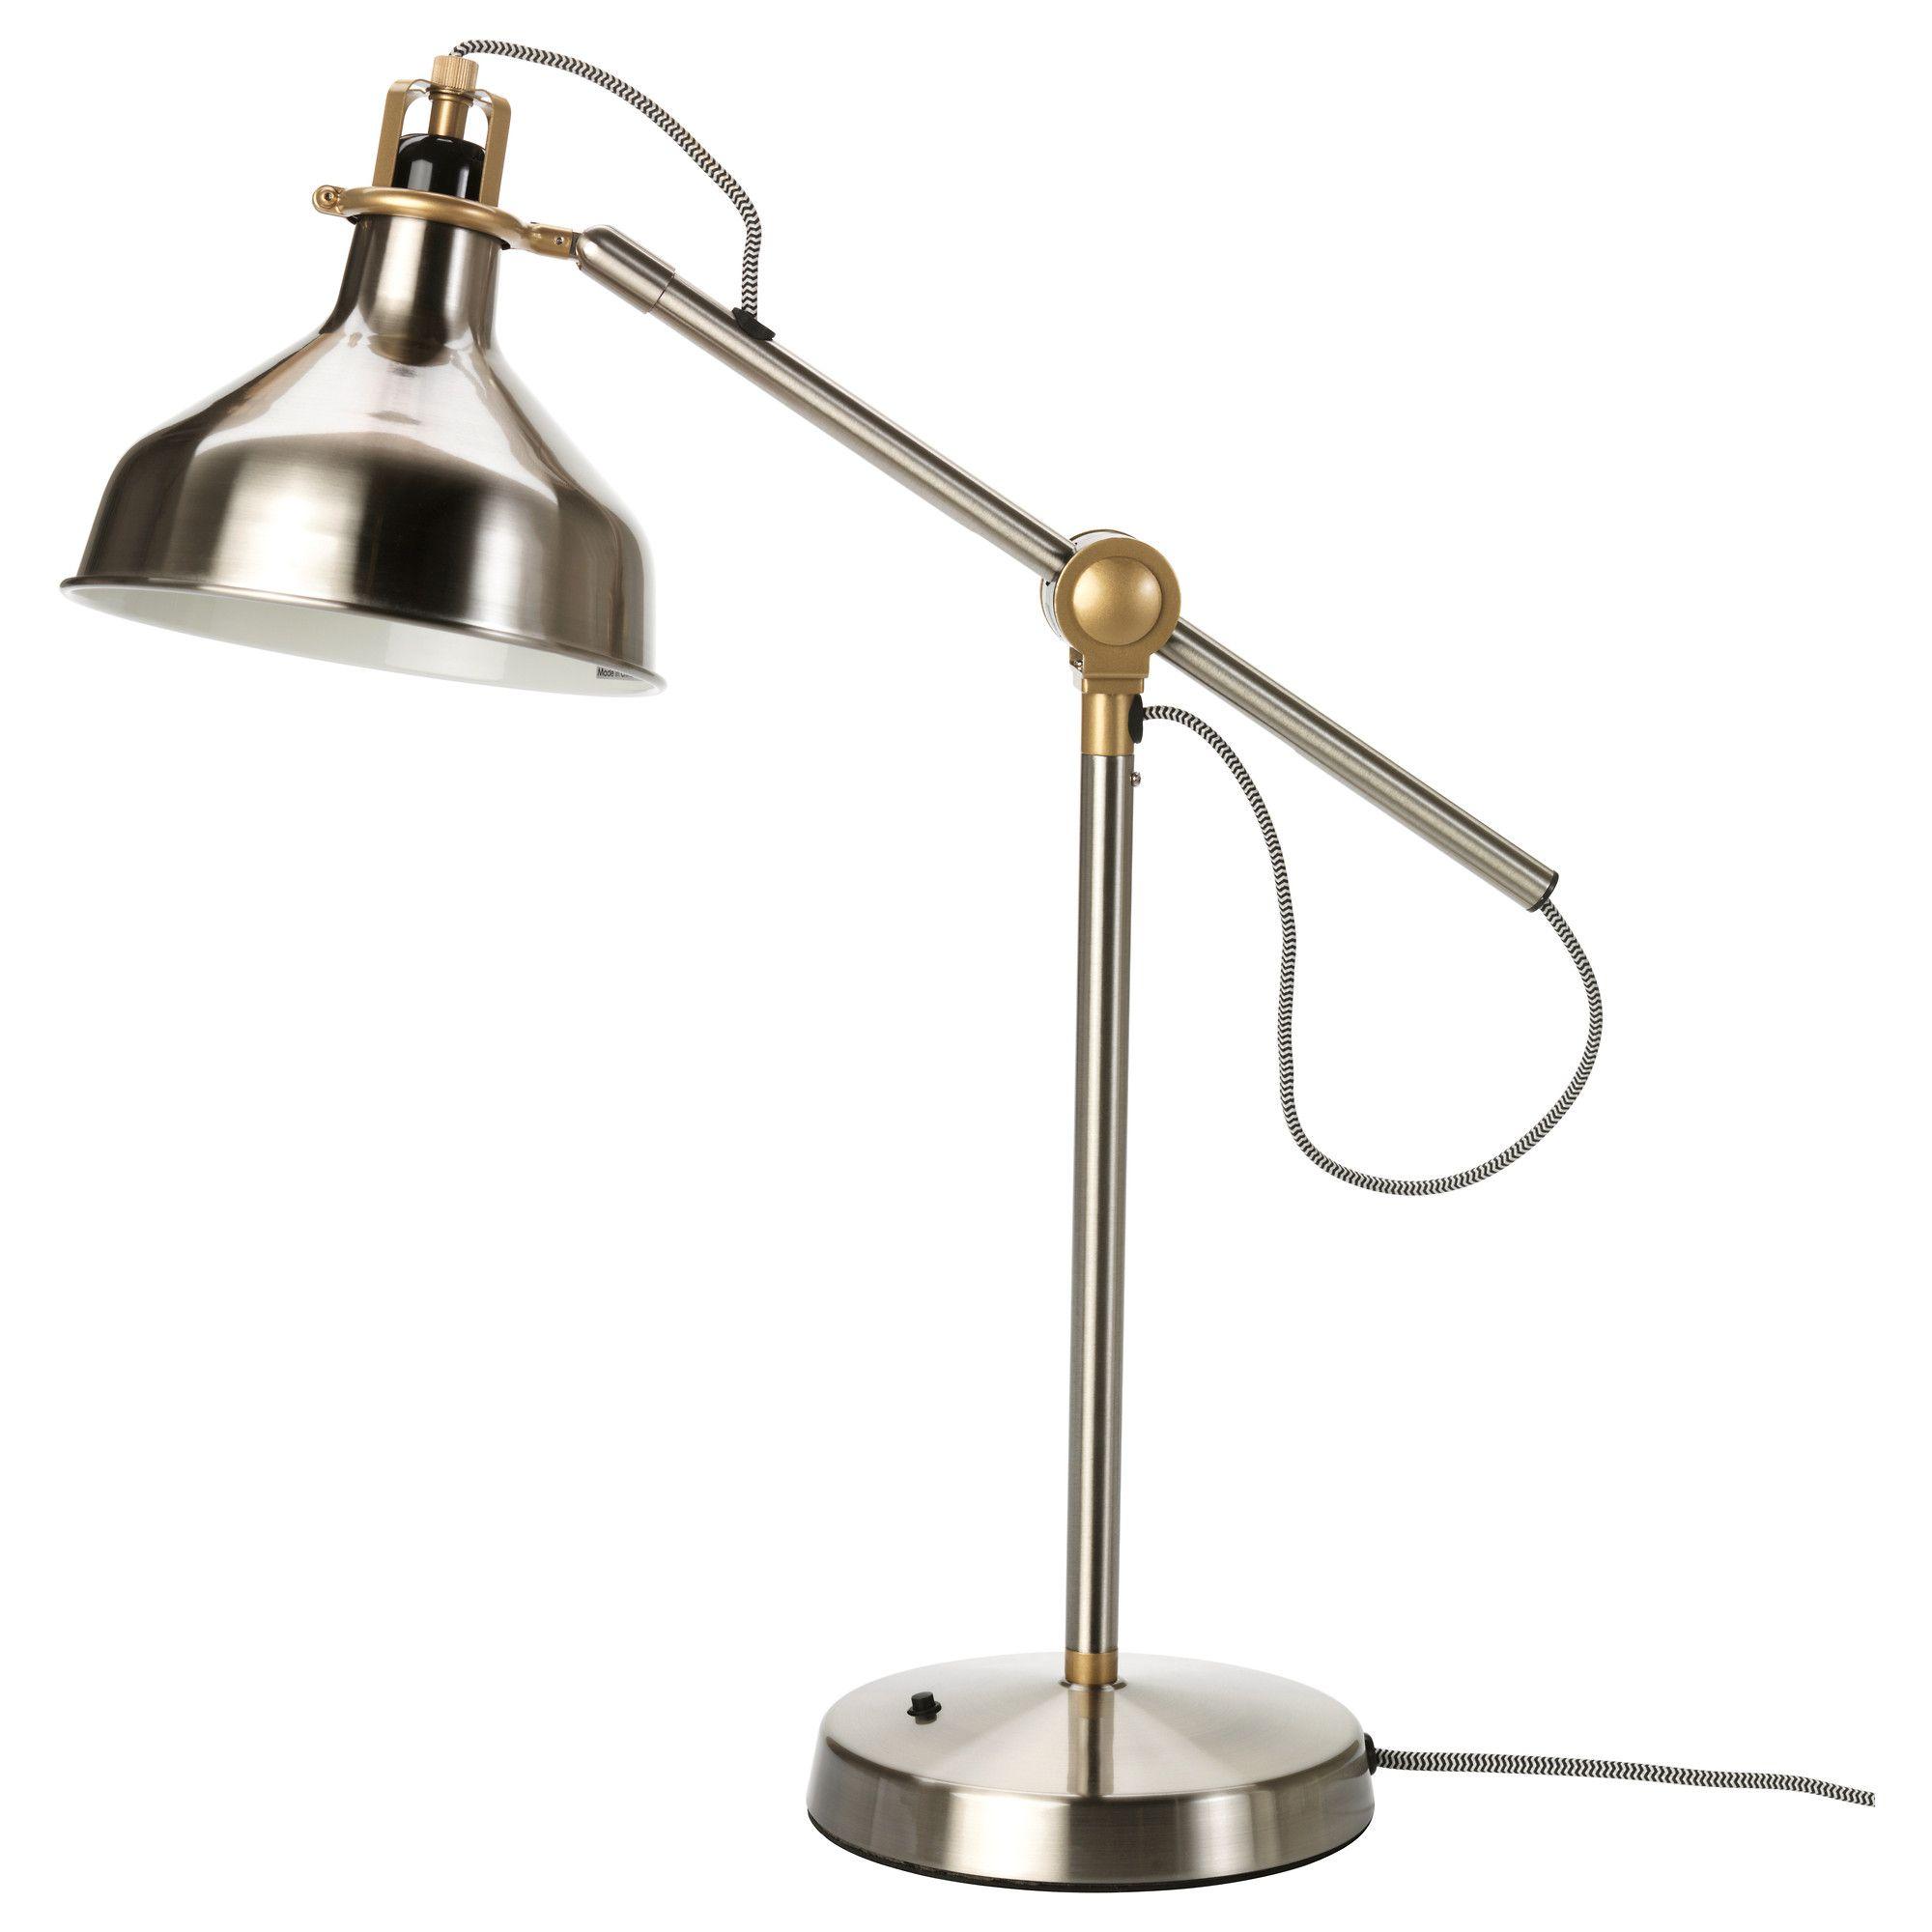 3d319111631ddaab0ab2205056bbdb23 30 Frais Lampe Cuivre Ikea Ksh4